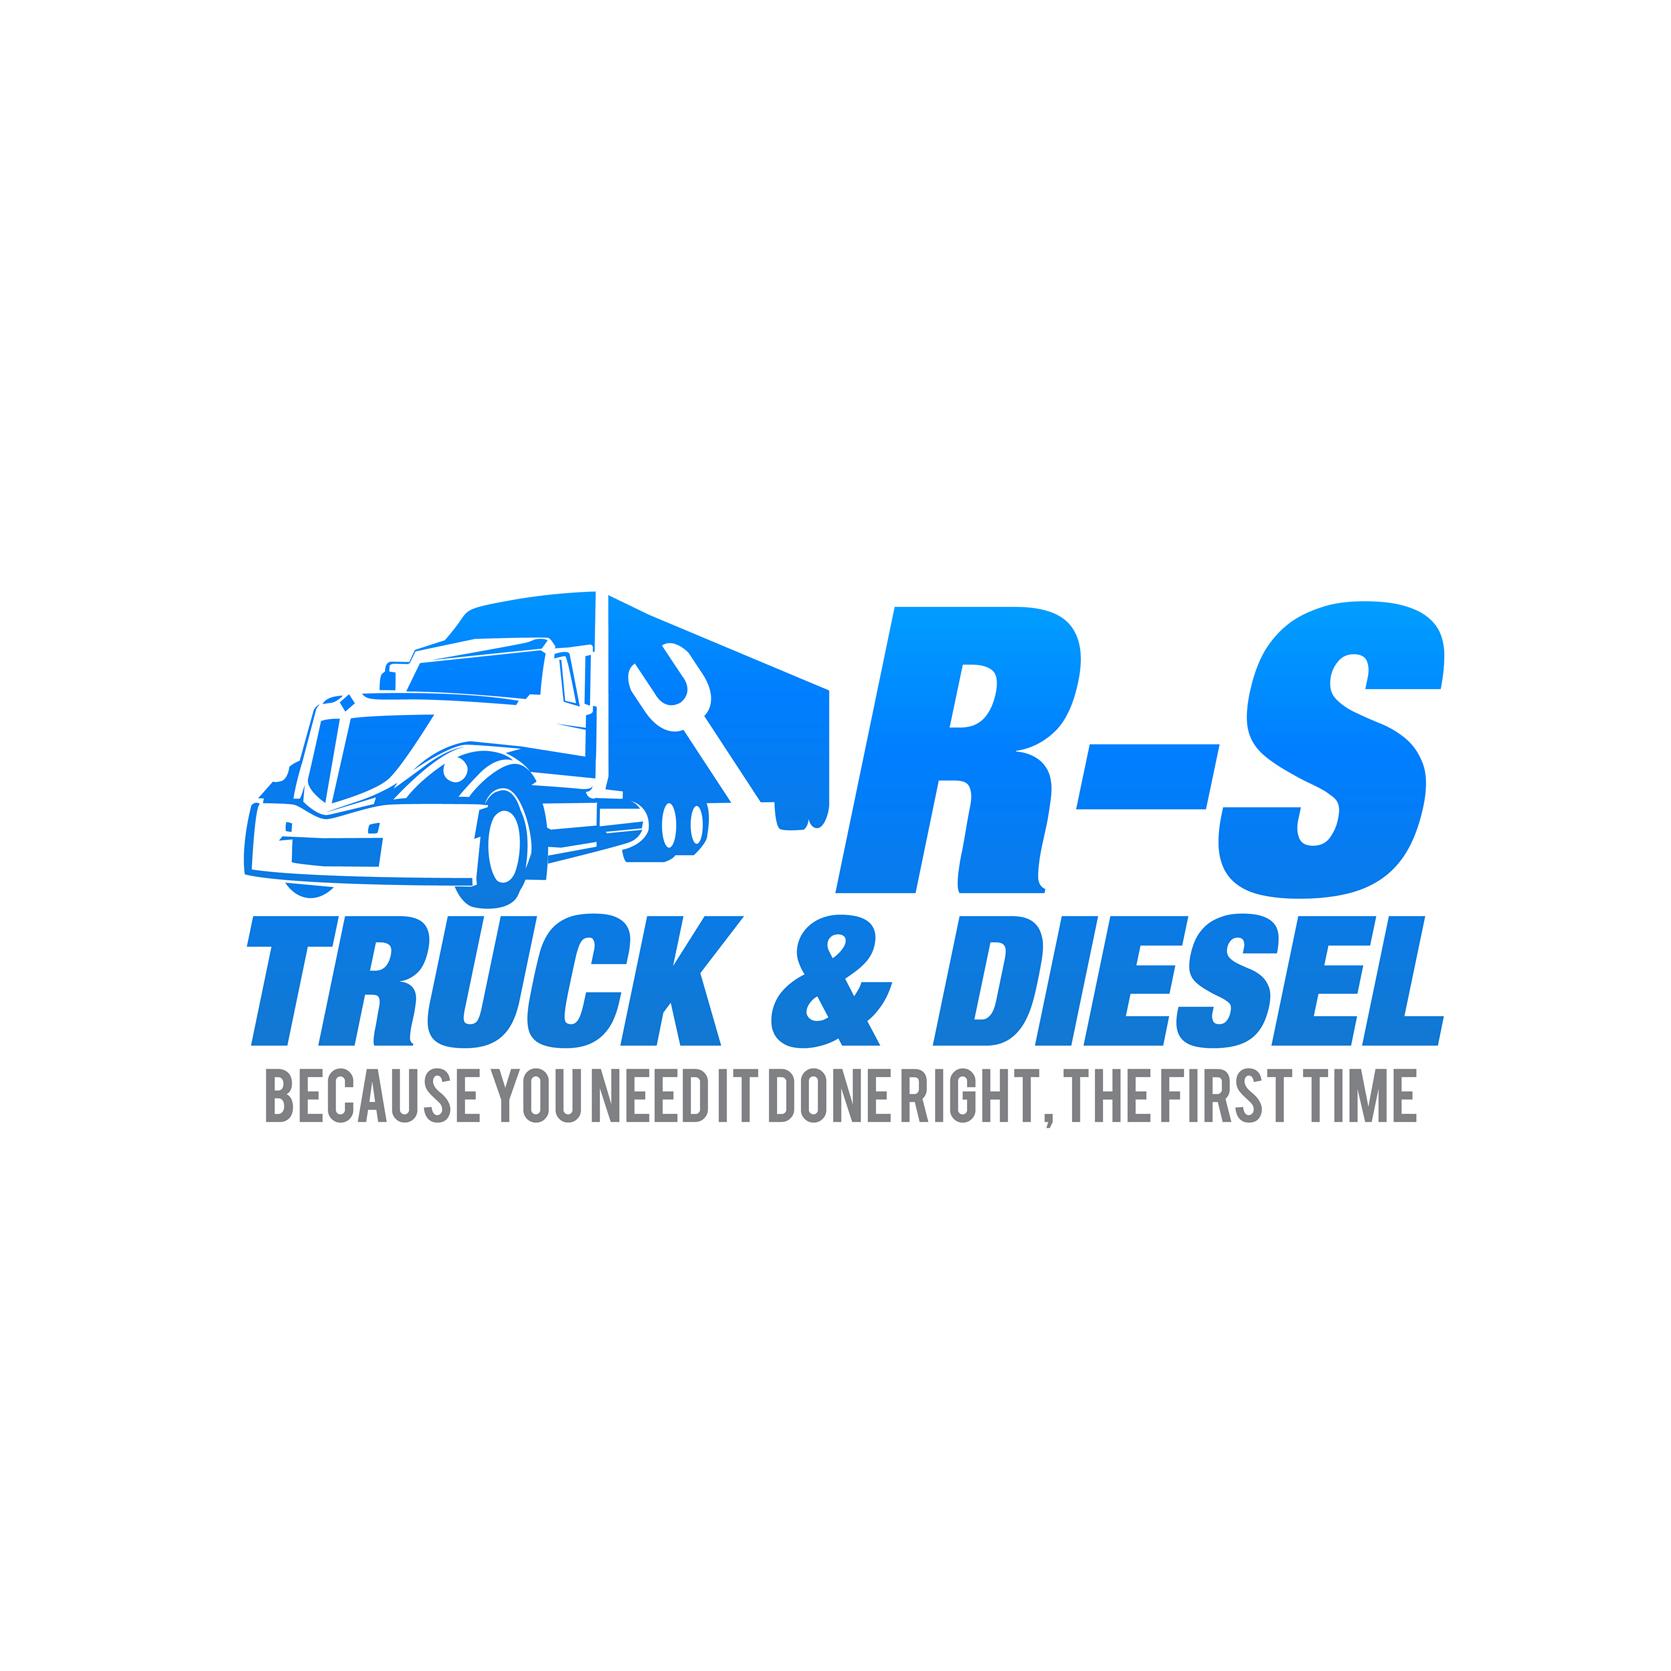 R-S Truck & Diesel - Battle Creek, MI 49015 - (269)746-3406 | ShowMeLocal.com